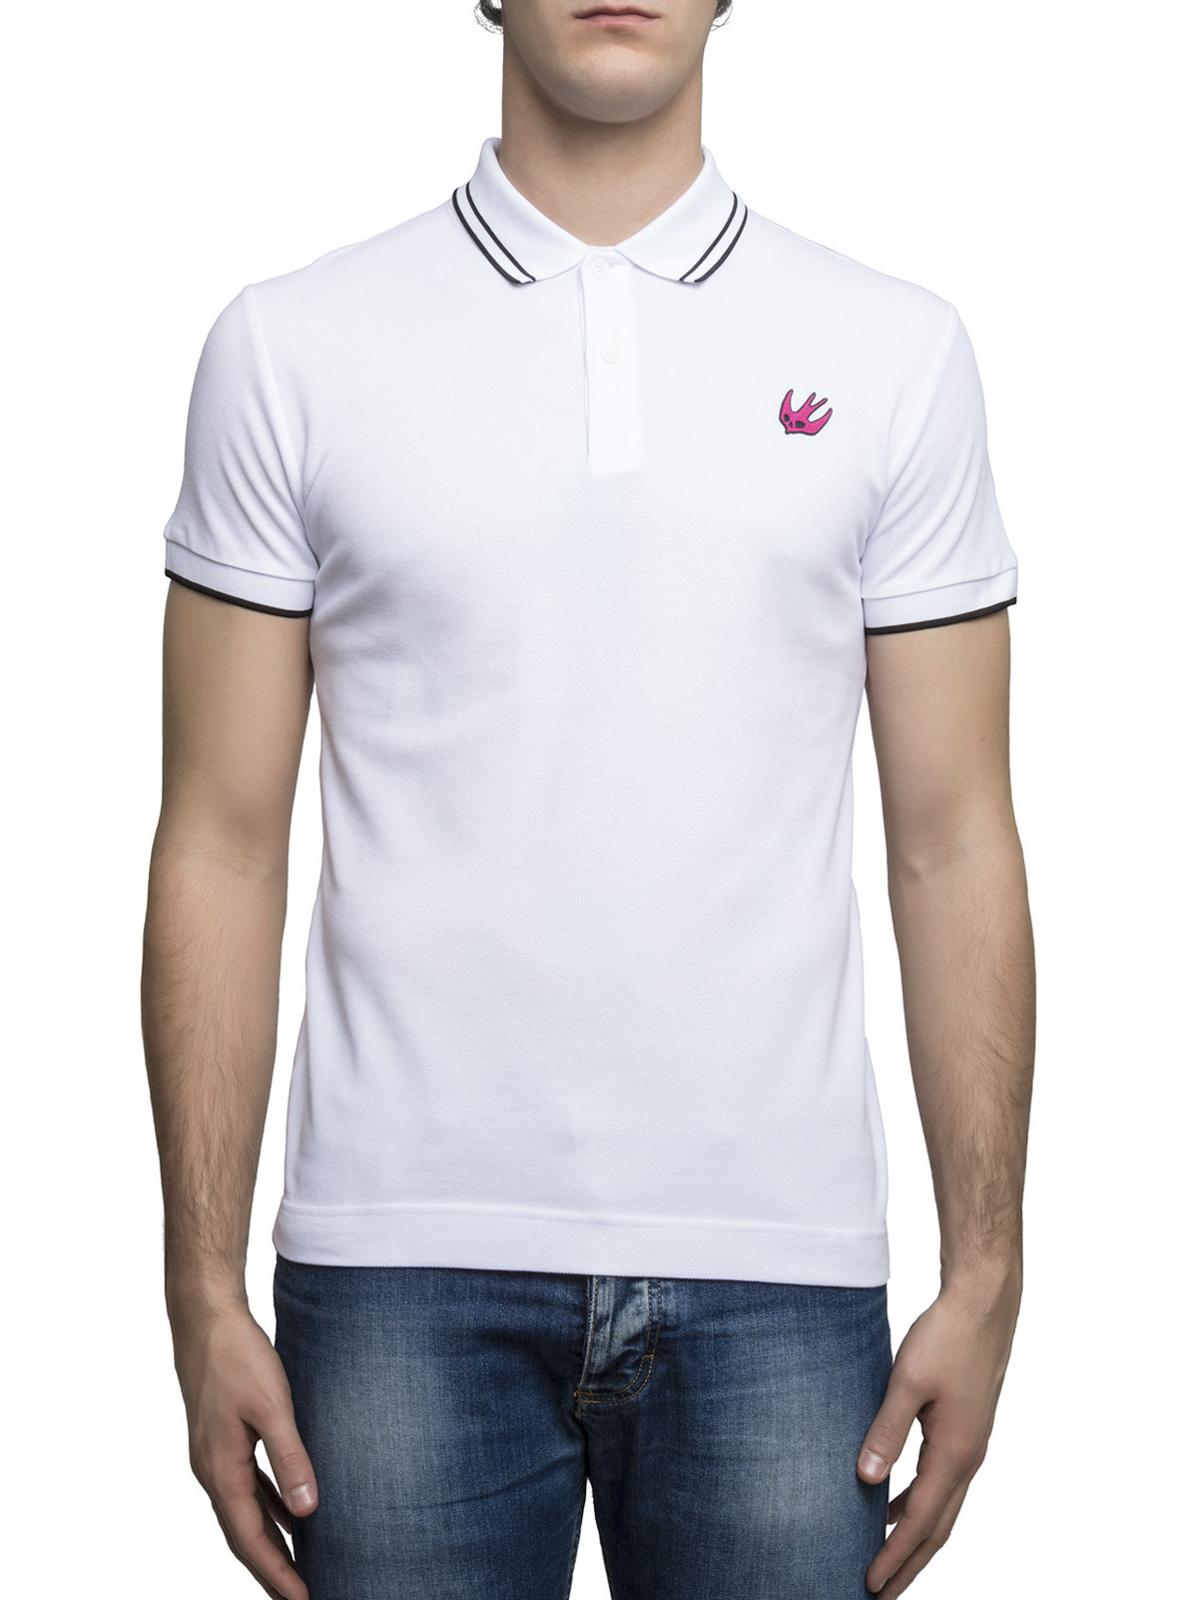 Mcq Swallow Embroidery Polo Shirt Polo Shirts 277624rht049000